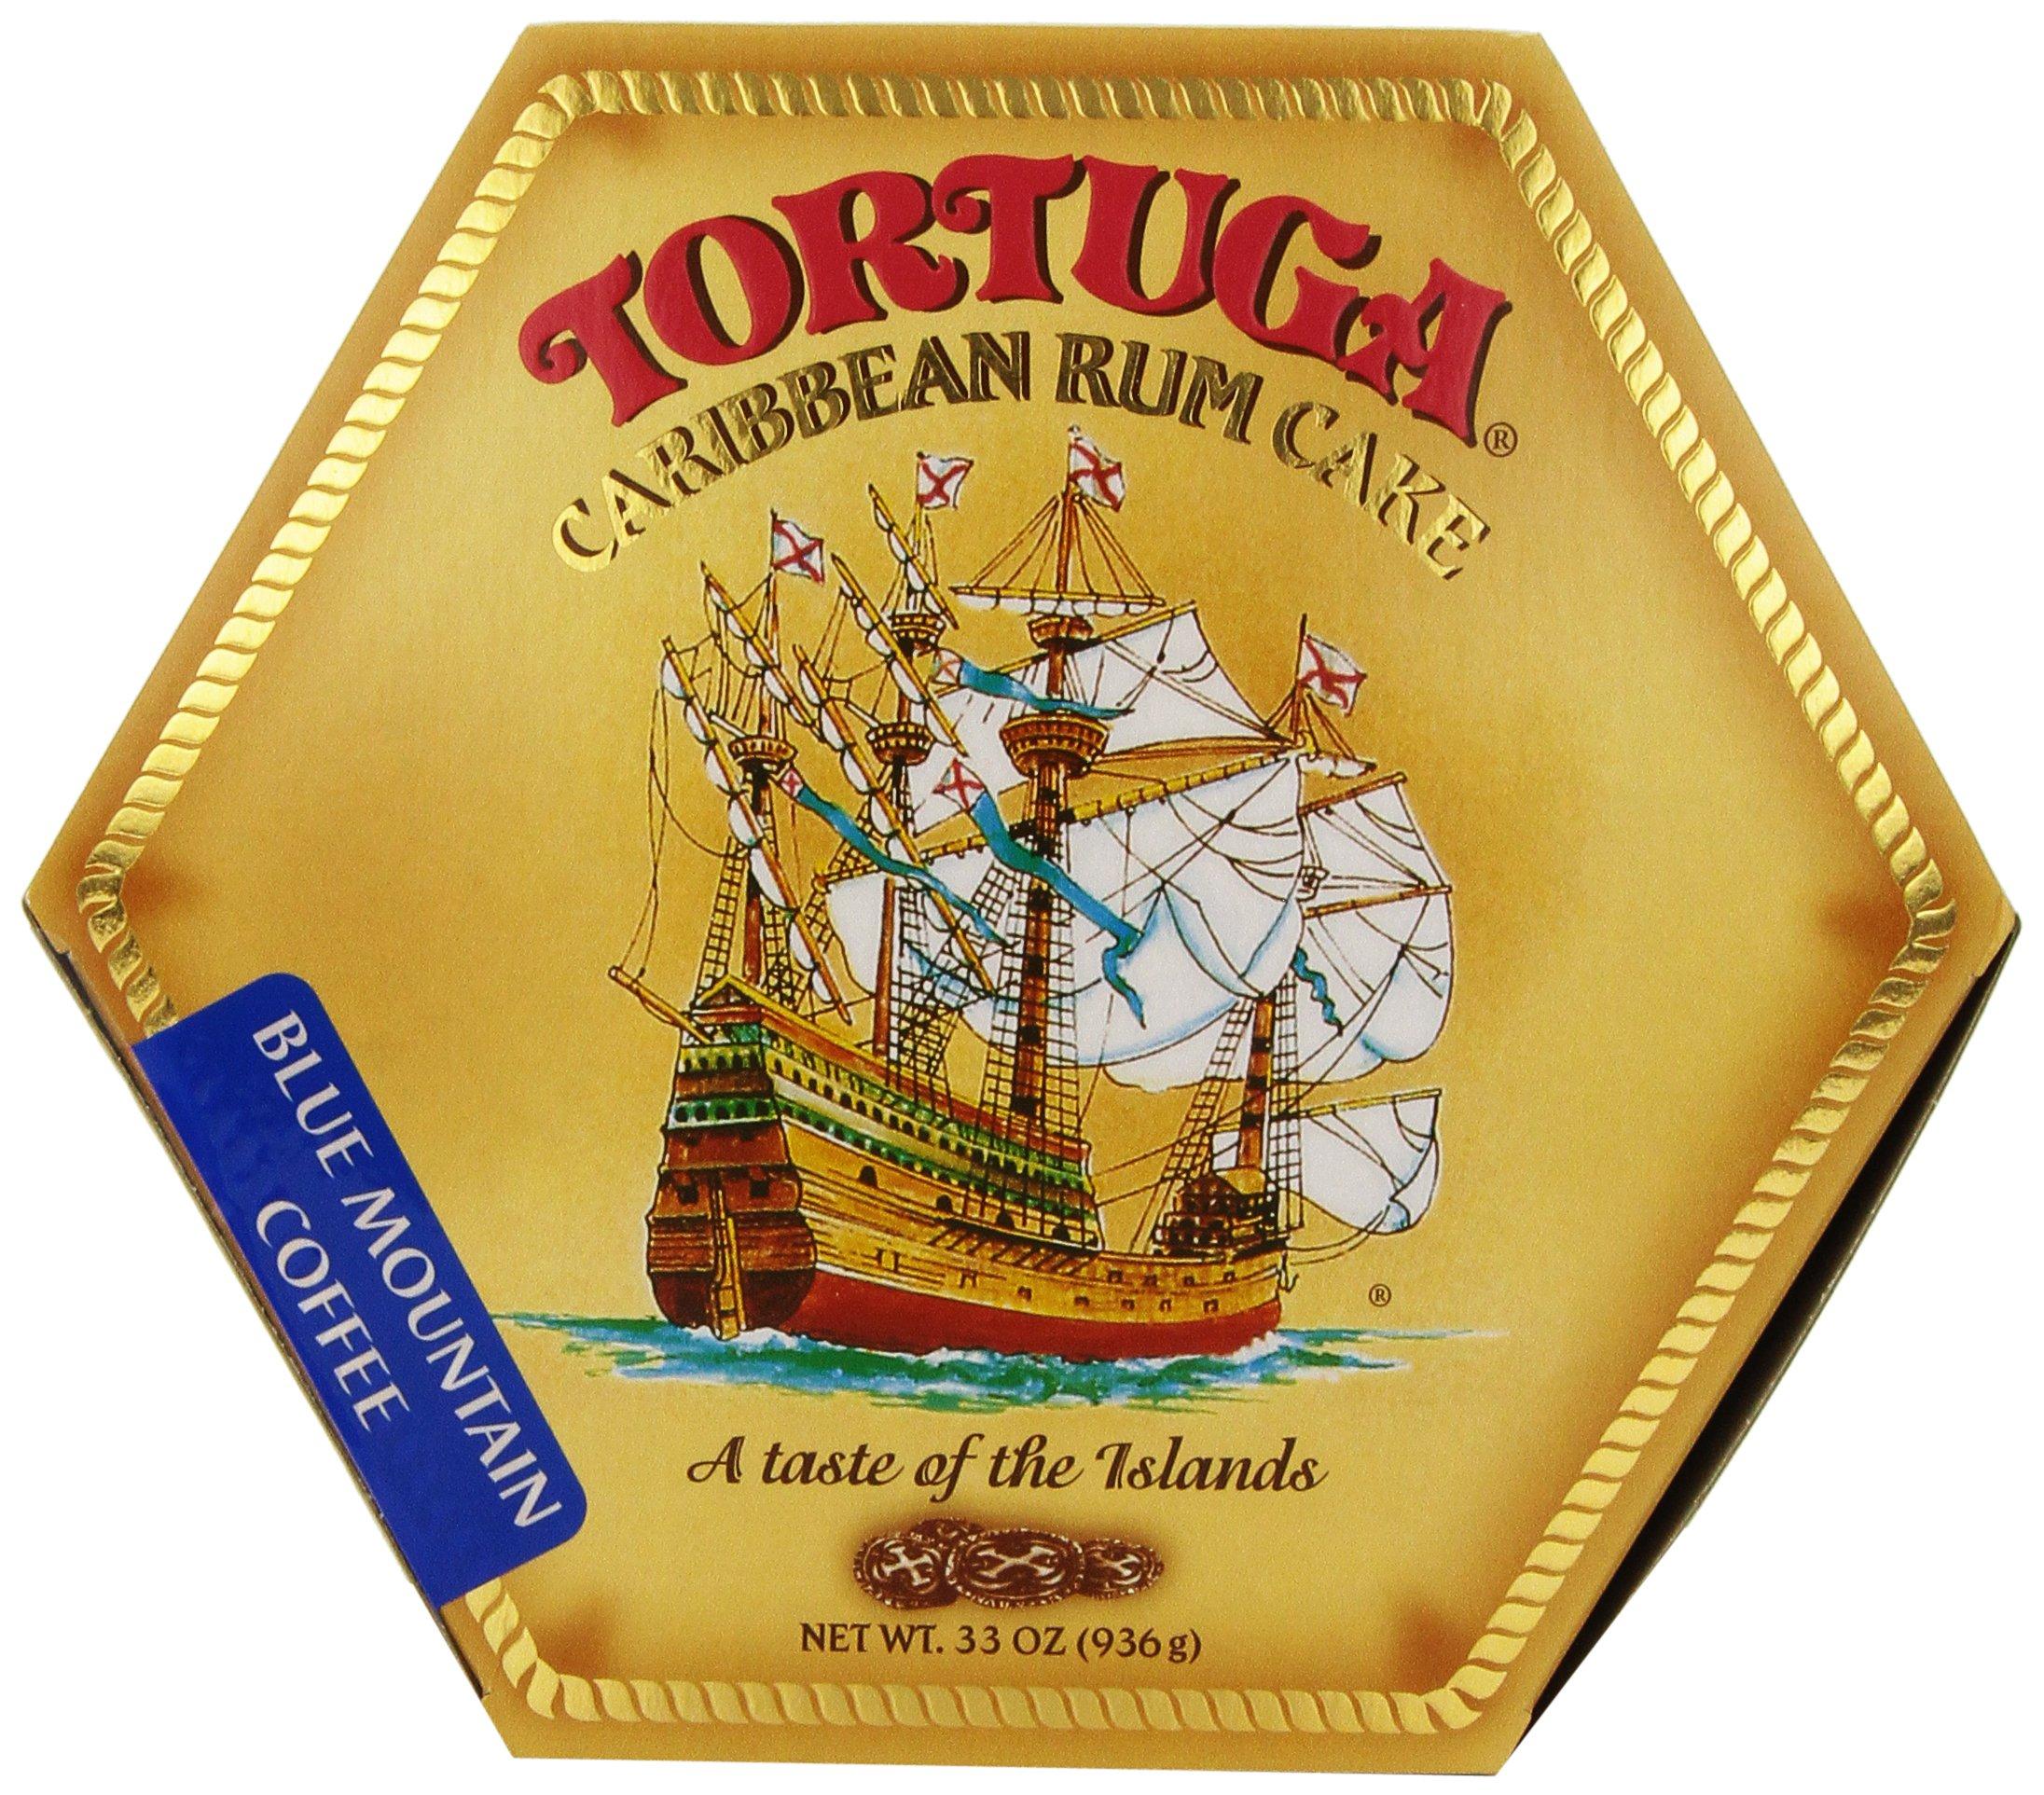 TORTUGA Caribbean Blue Mountain Rum Cake - 32 oz. - The Perfect Premium Gourmet Gift by TORTUGA (Image #1)